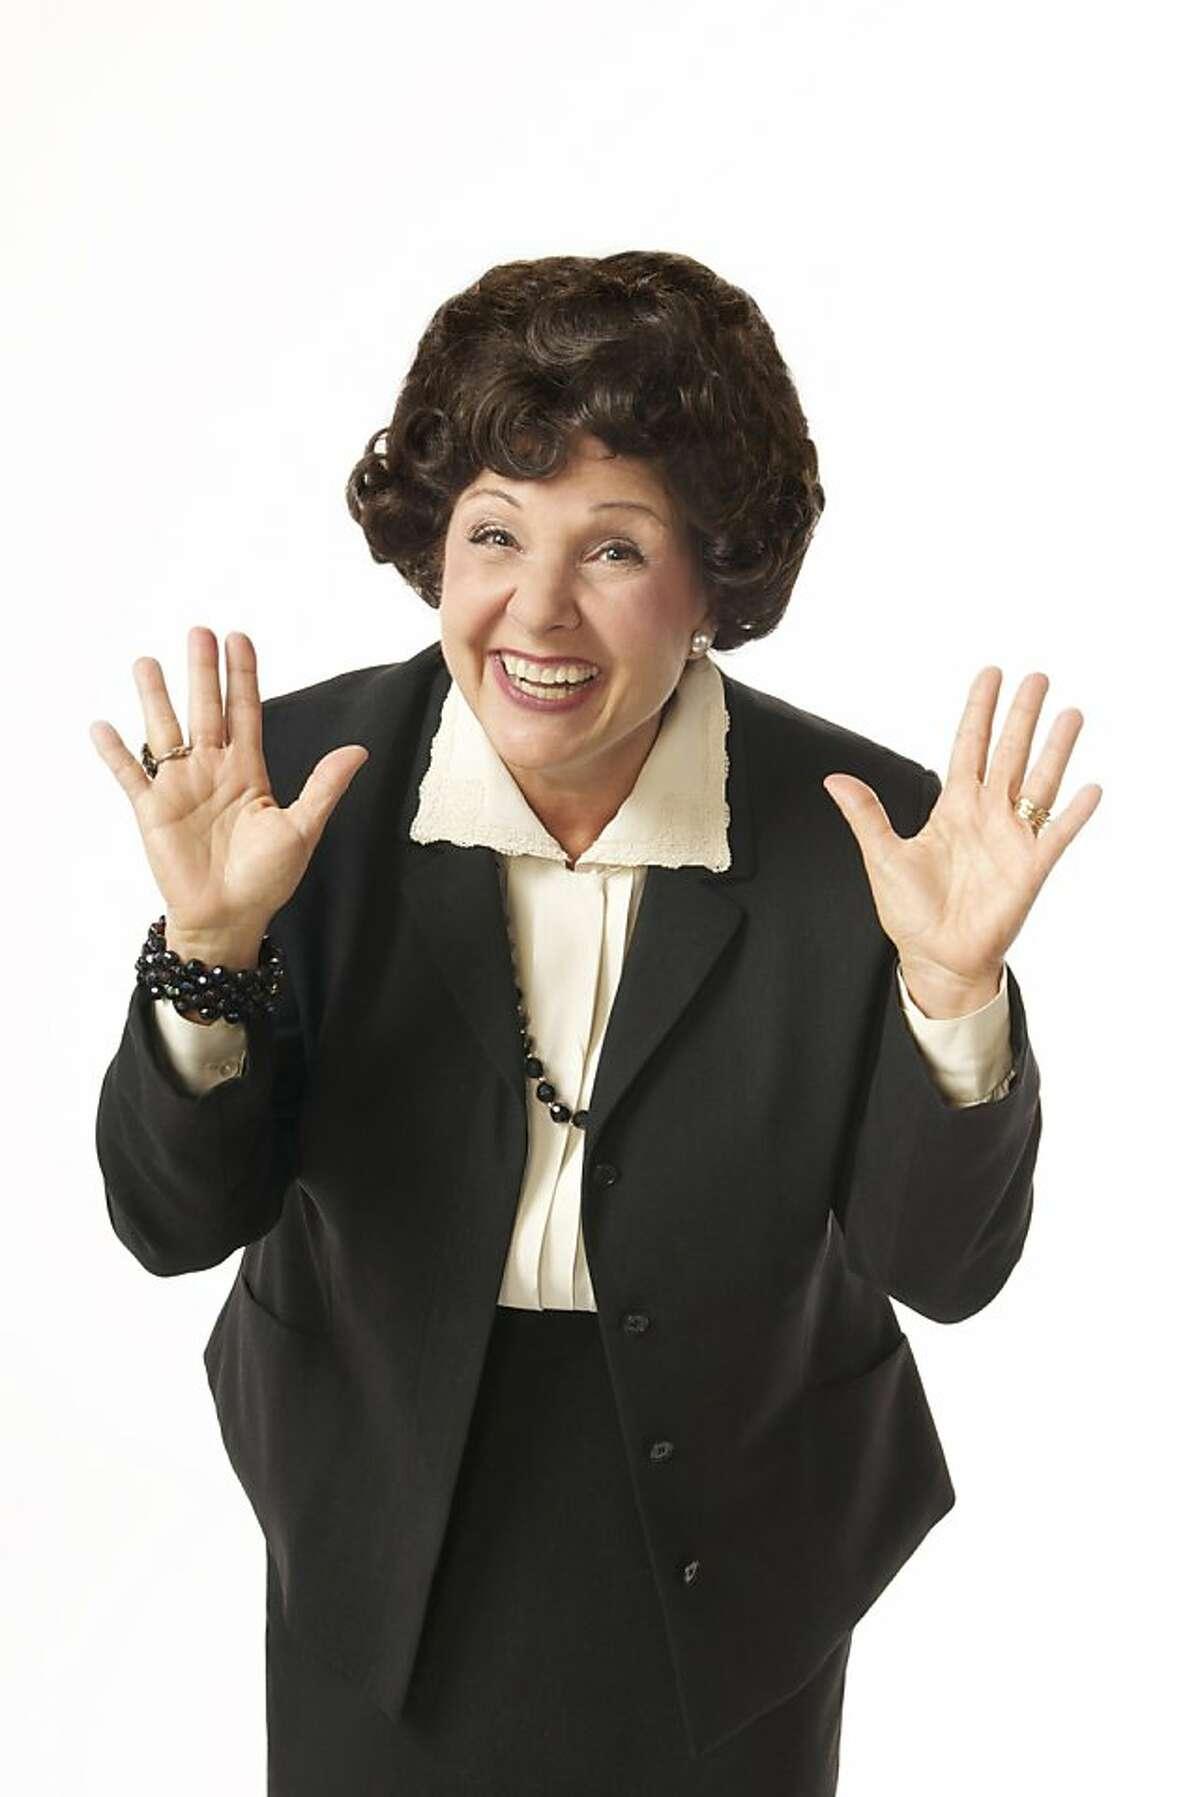 Kerri Shawn plays Ann Landers in